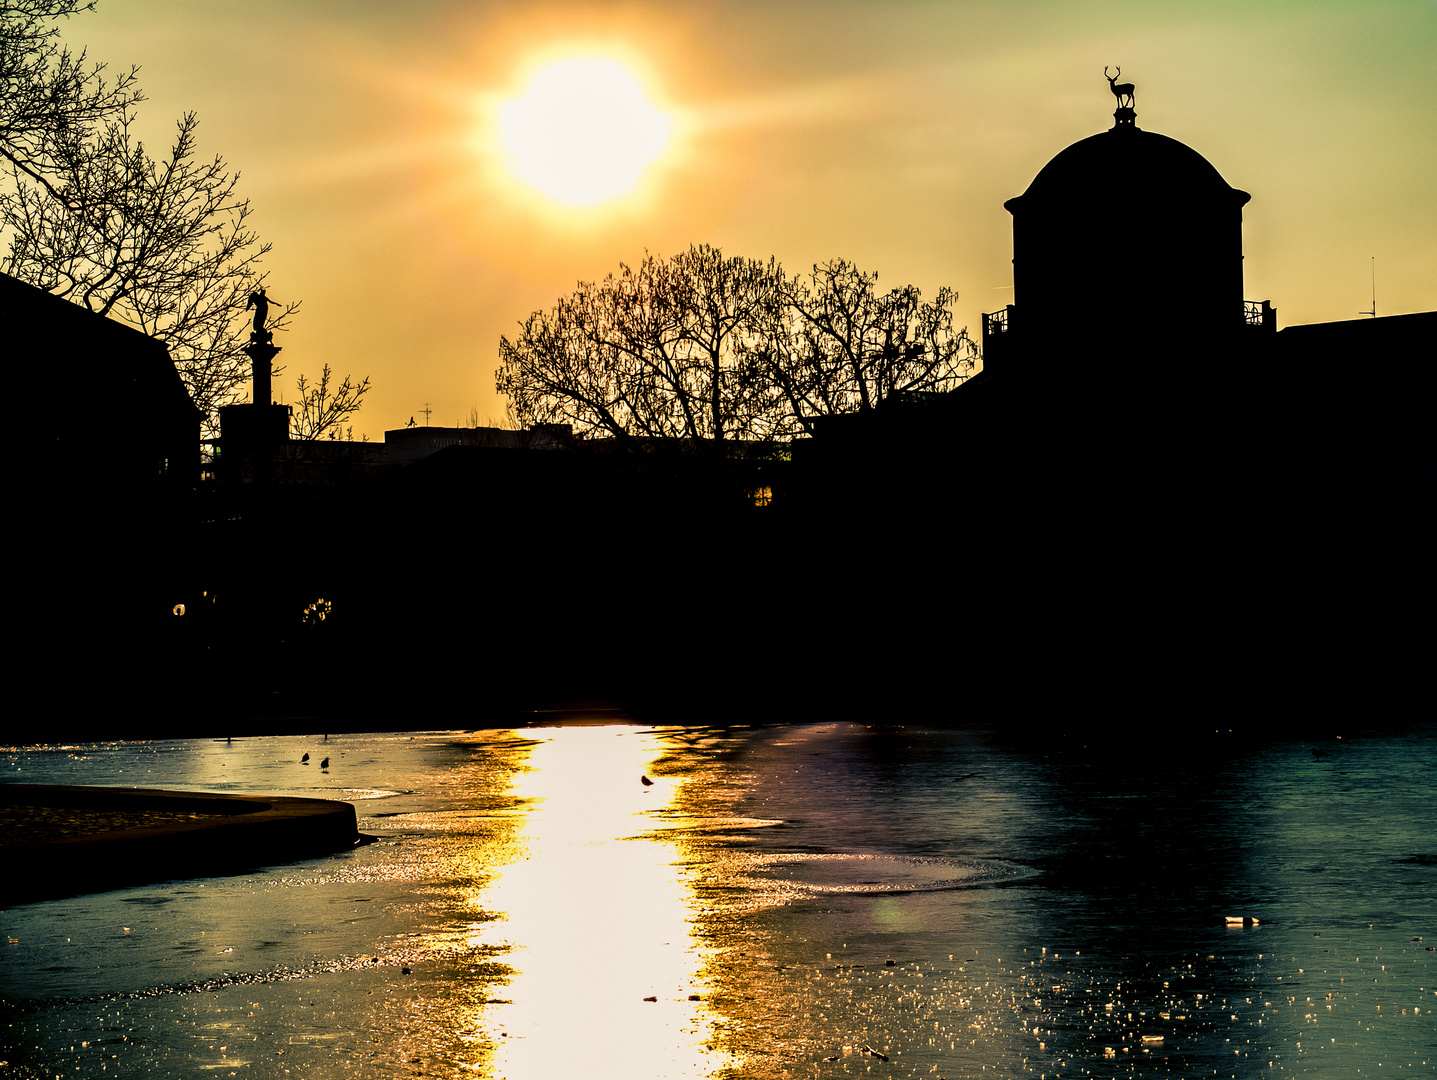 Sonnenuntergang im Schloßpark Stuttgart